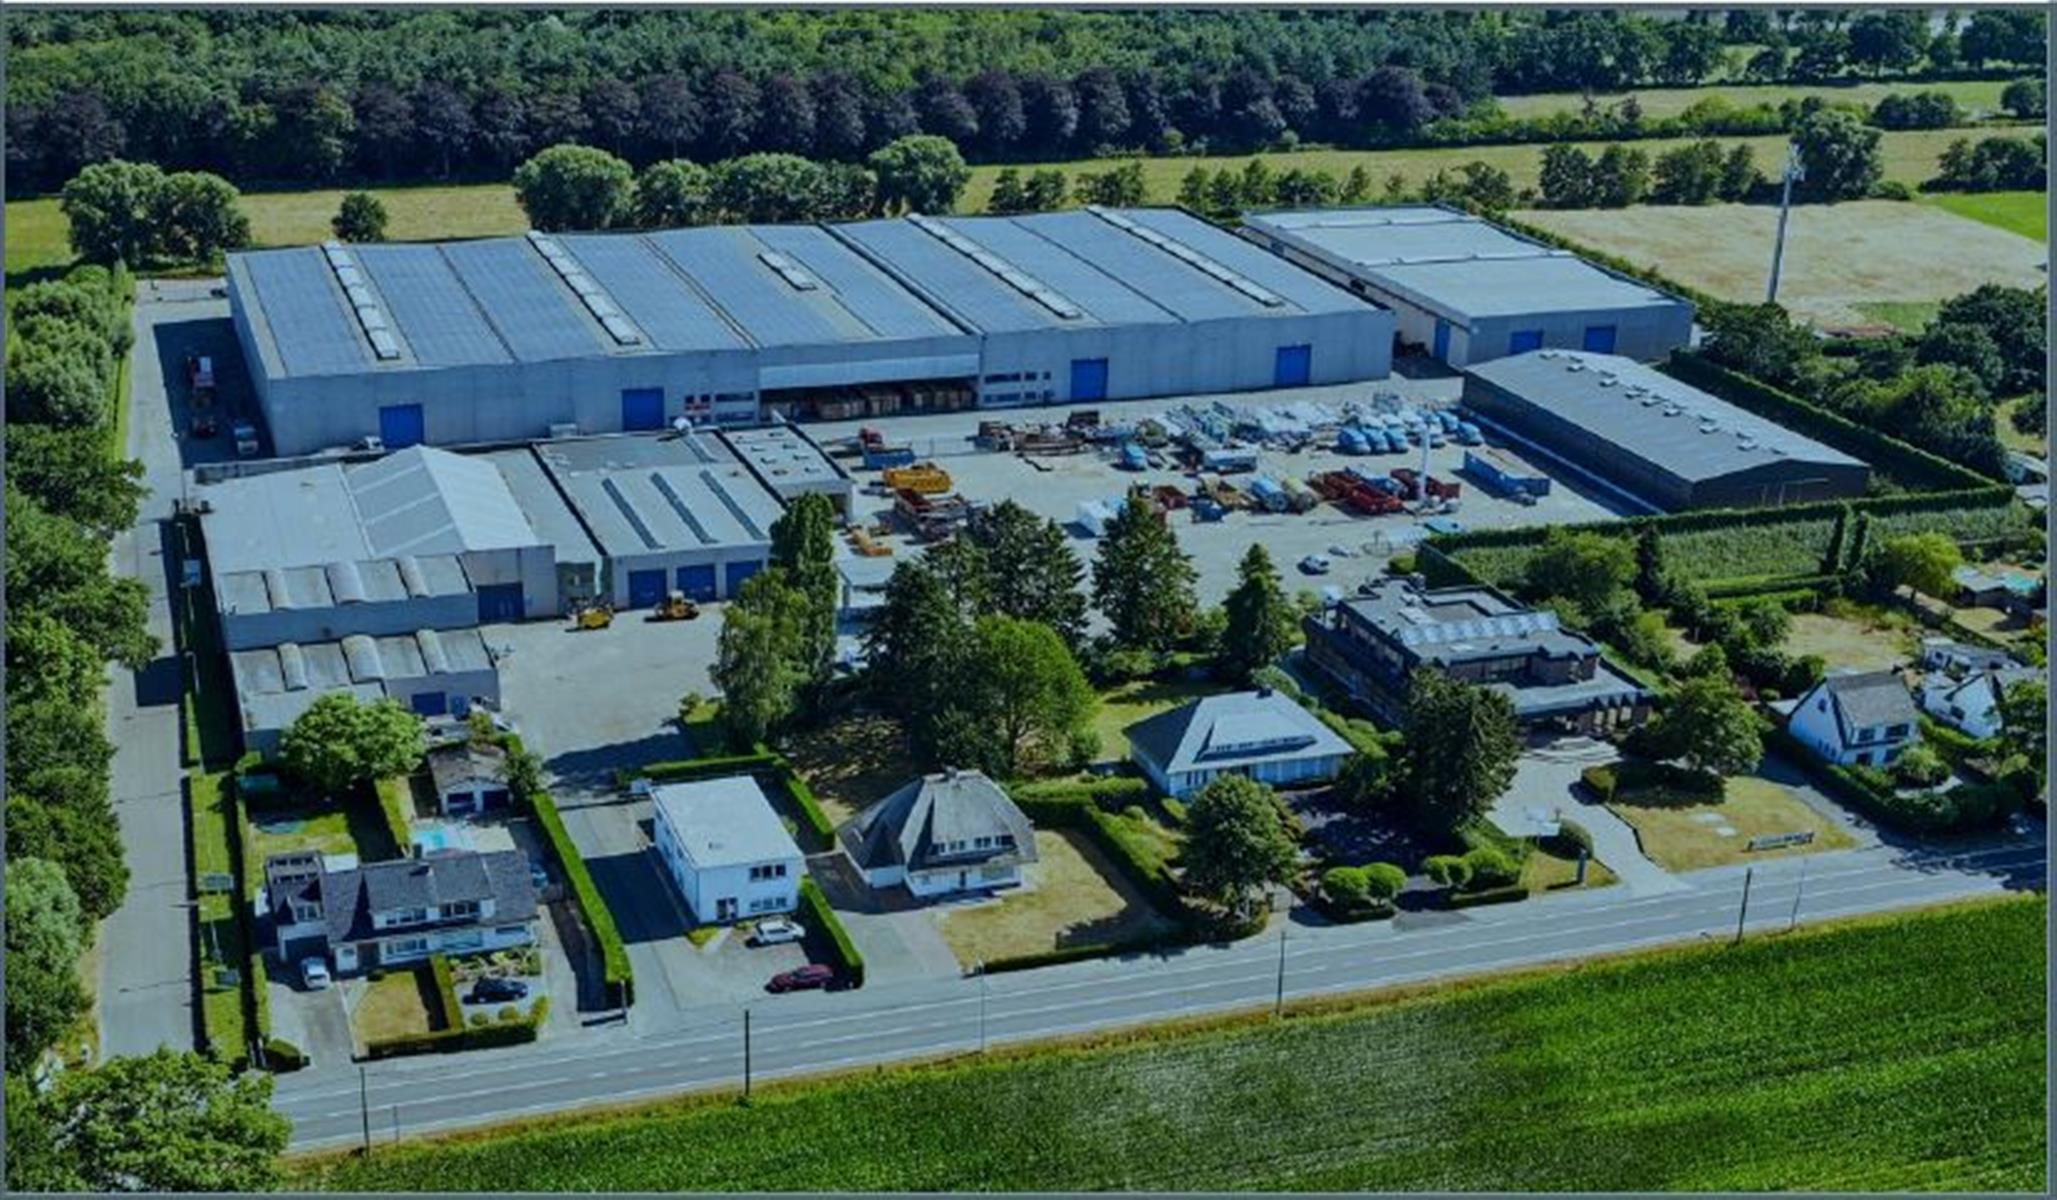 industrieel gebouw te huur KMO UNIT 1620m² MEERDERE LOADING DOCKS te KAPELLEN (B002) 1640m² - 2950 Kapellen, België 1